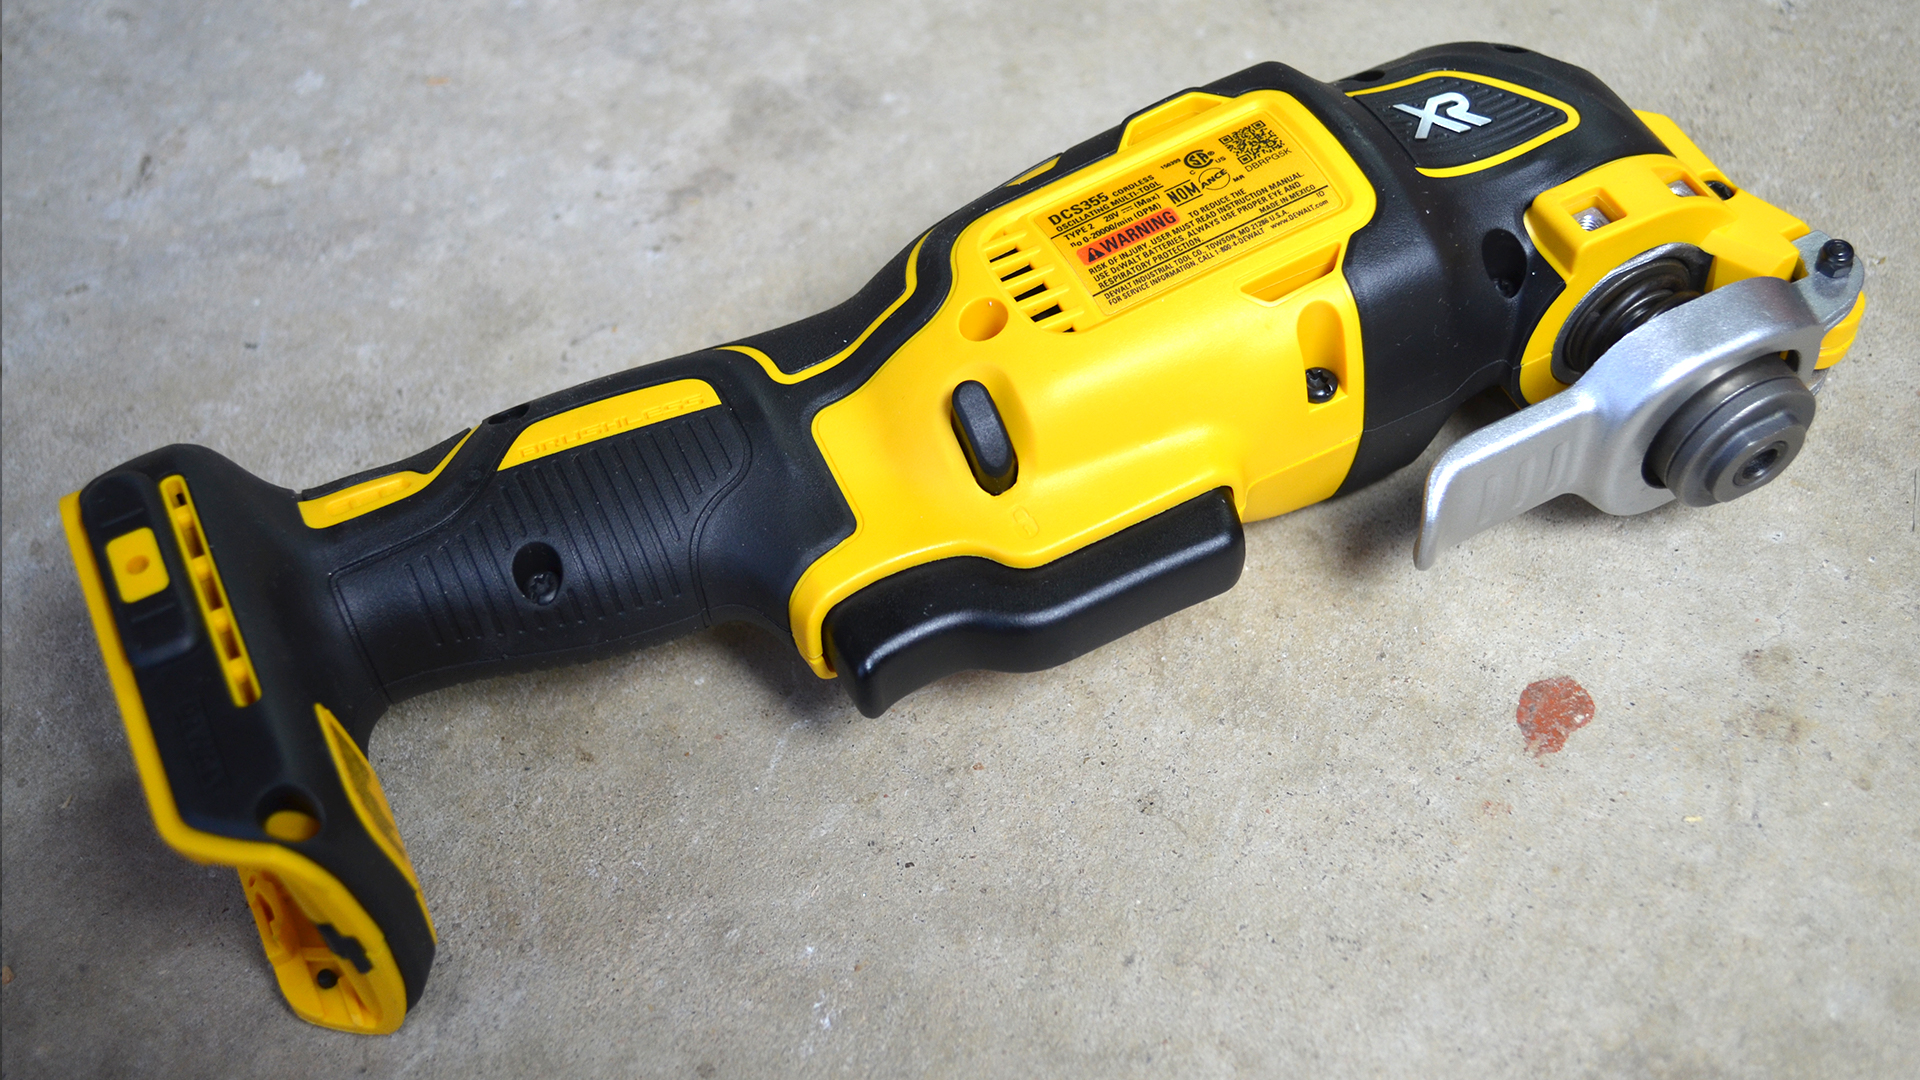 DeWalt-3-Tool-20v-MAX-Cordless-Combo-Kit-oscillating-cutting-tool